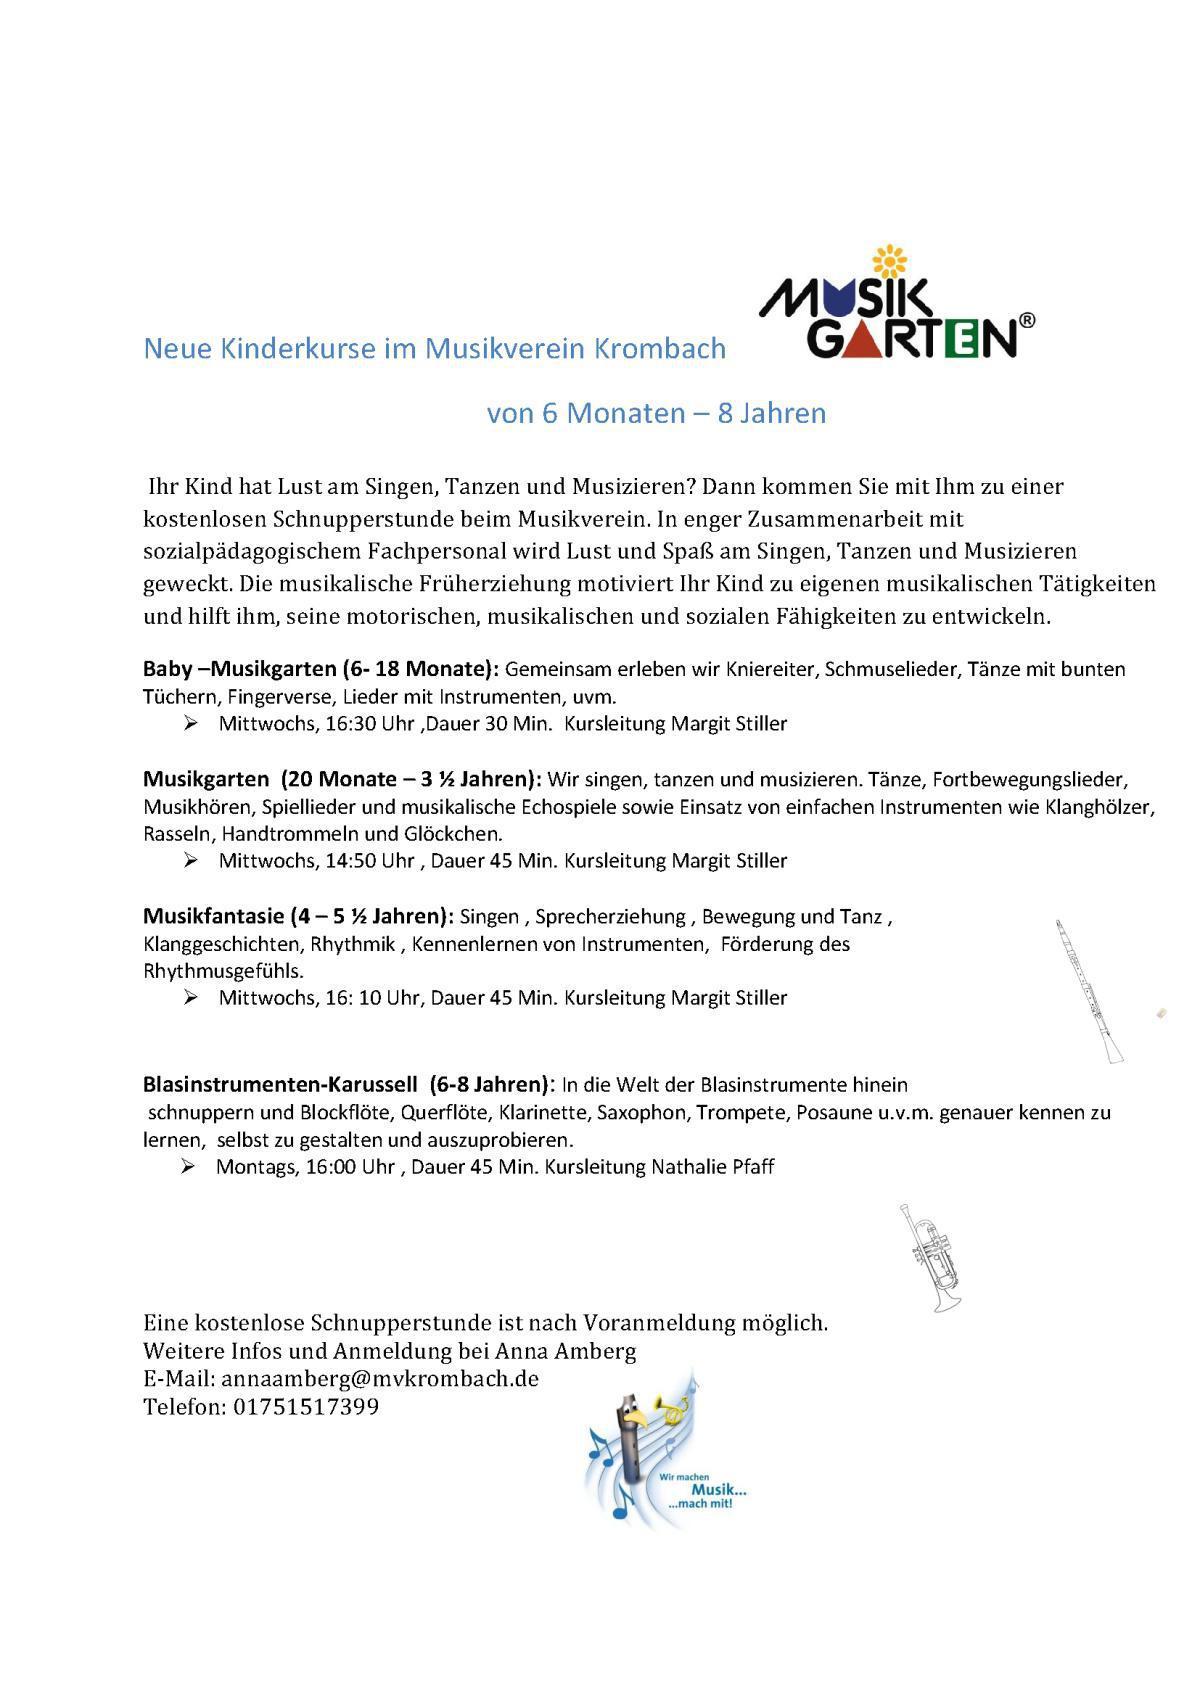 Musikverein: »Neue Kinderkurse«